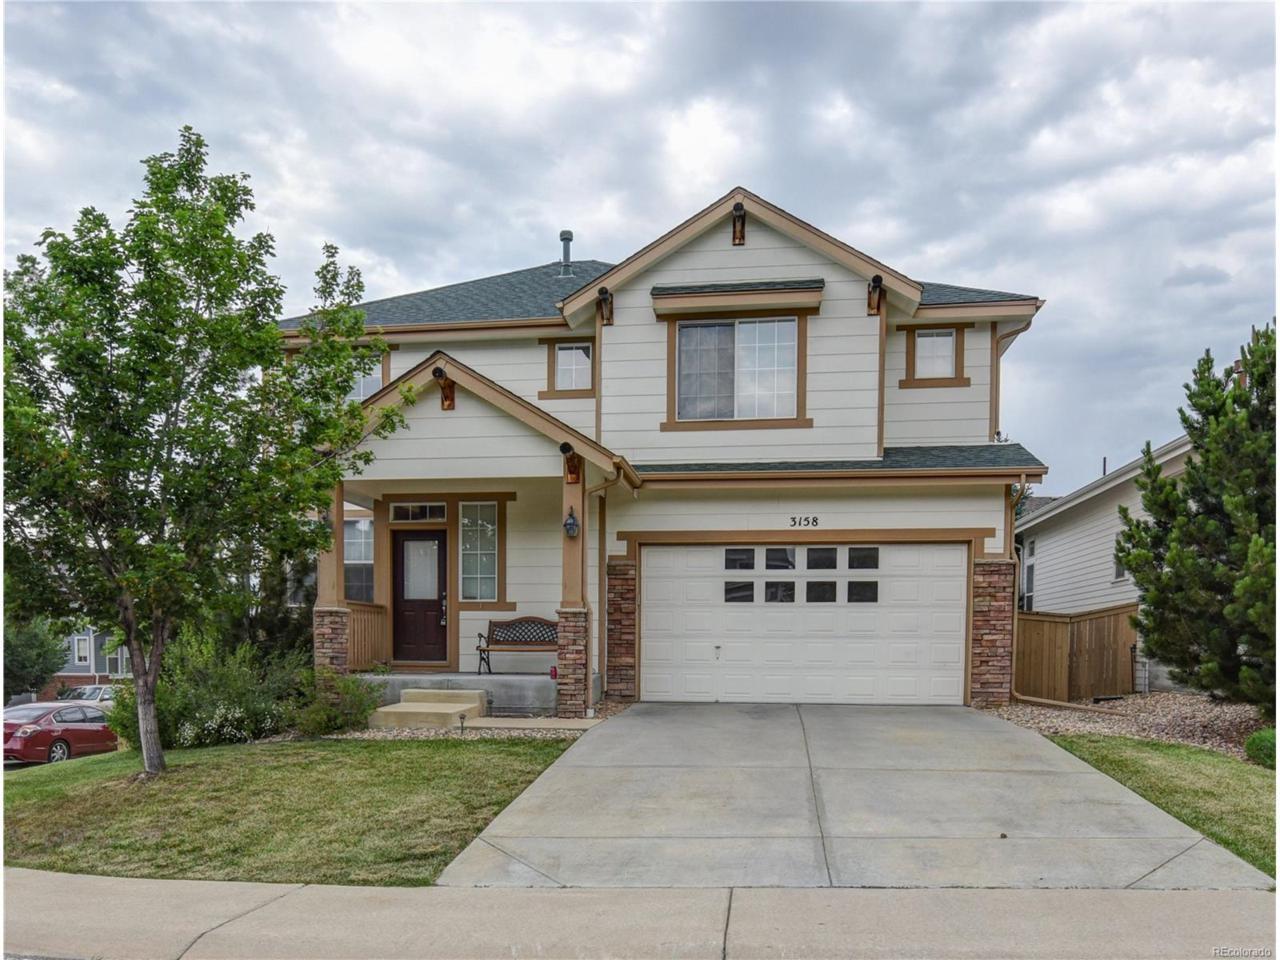 3158 Woodbriar Drive, Highlands Ranch, CO 80126 (MLS #1641126) :: 8z Real Estate